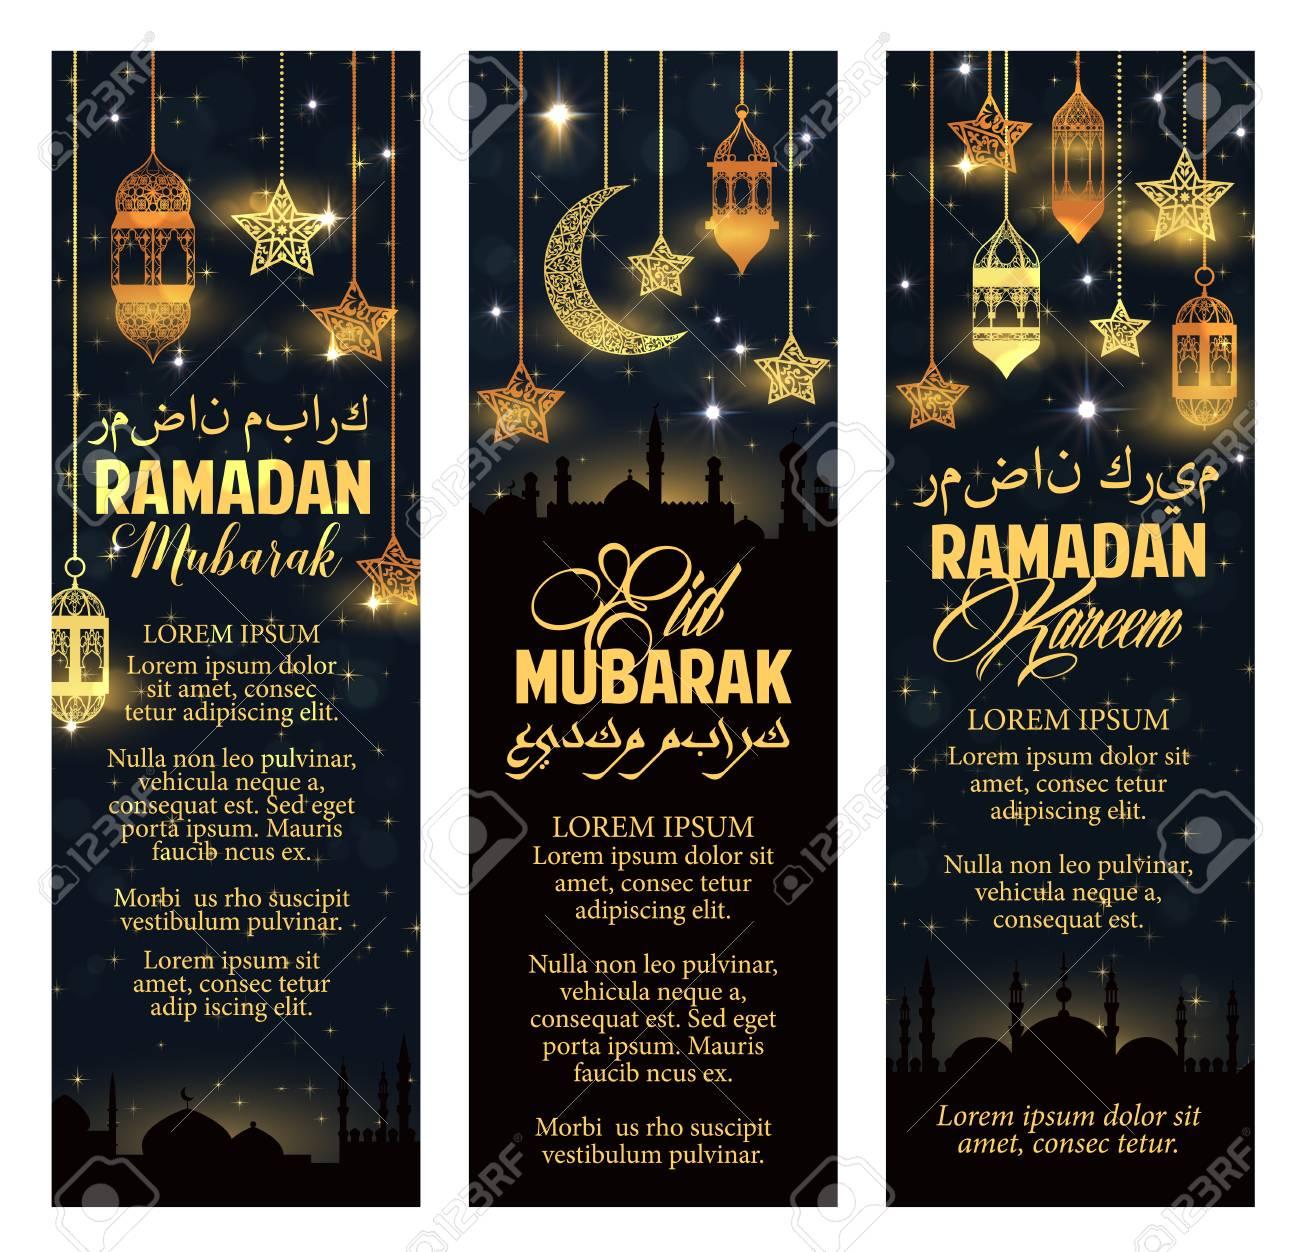 Ramadan kareem and eid mubarak greeting banners for muslim religious ramadan kareem and eid mubarak greeting banners for muslim religious holidays vector decor of lanterns m4hsunfo